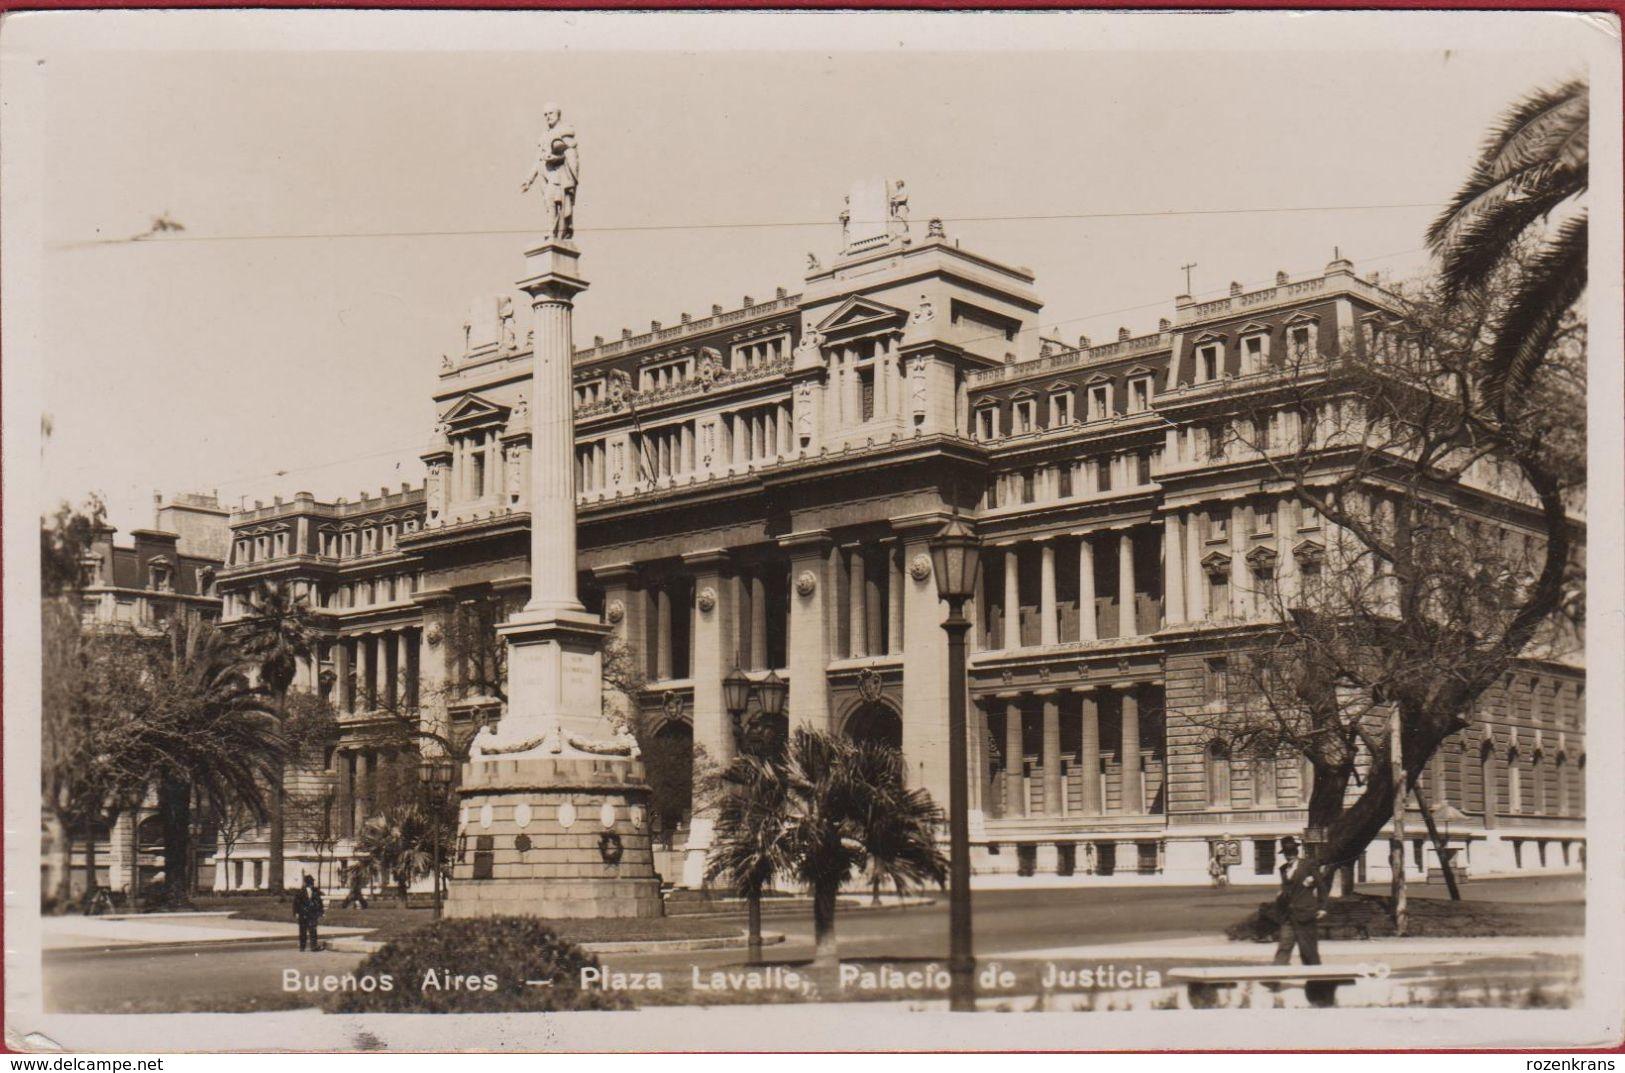 Argentina Argentine Plaza Lavalle Palacio De Justicia Buenos Aires Argentinie Tram Tramway - Argentine